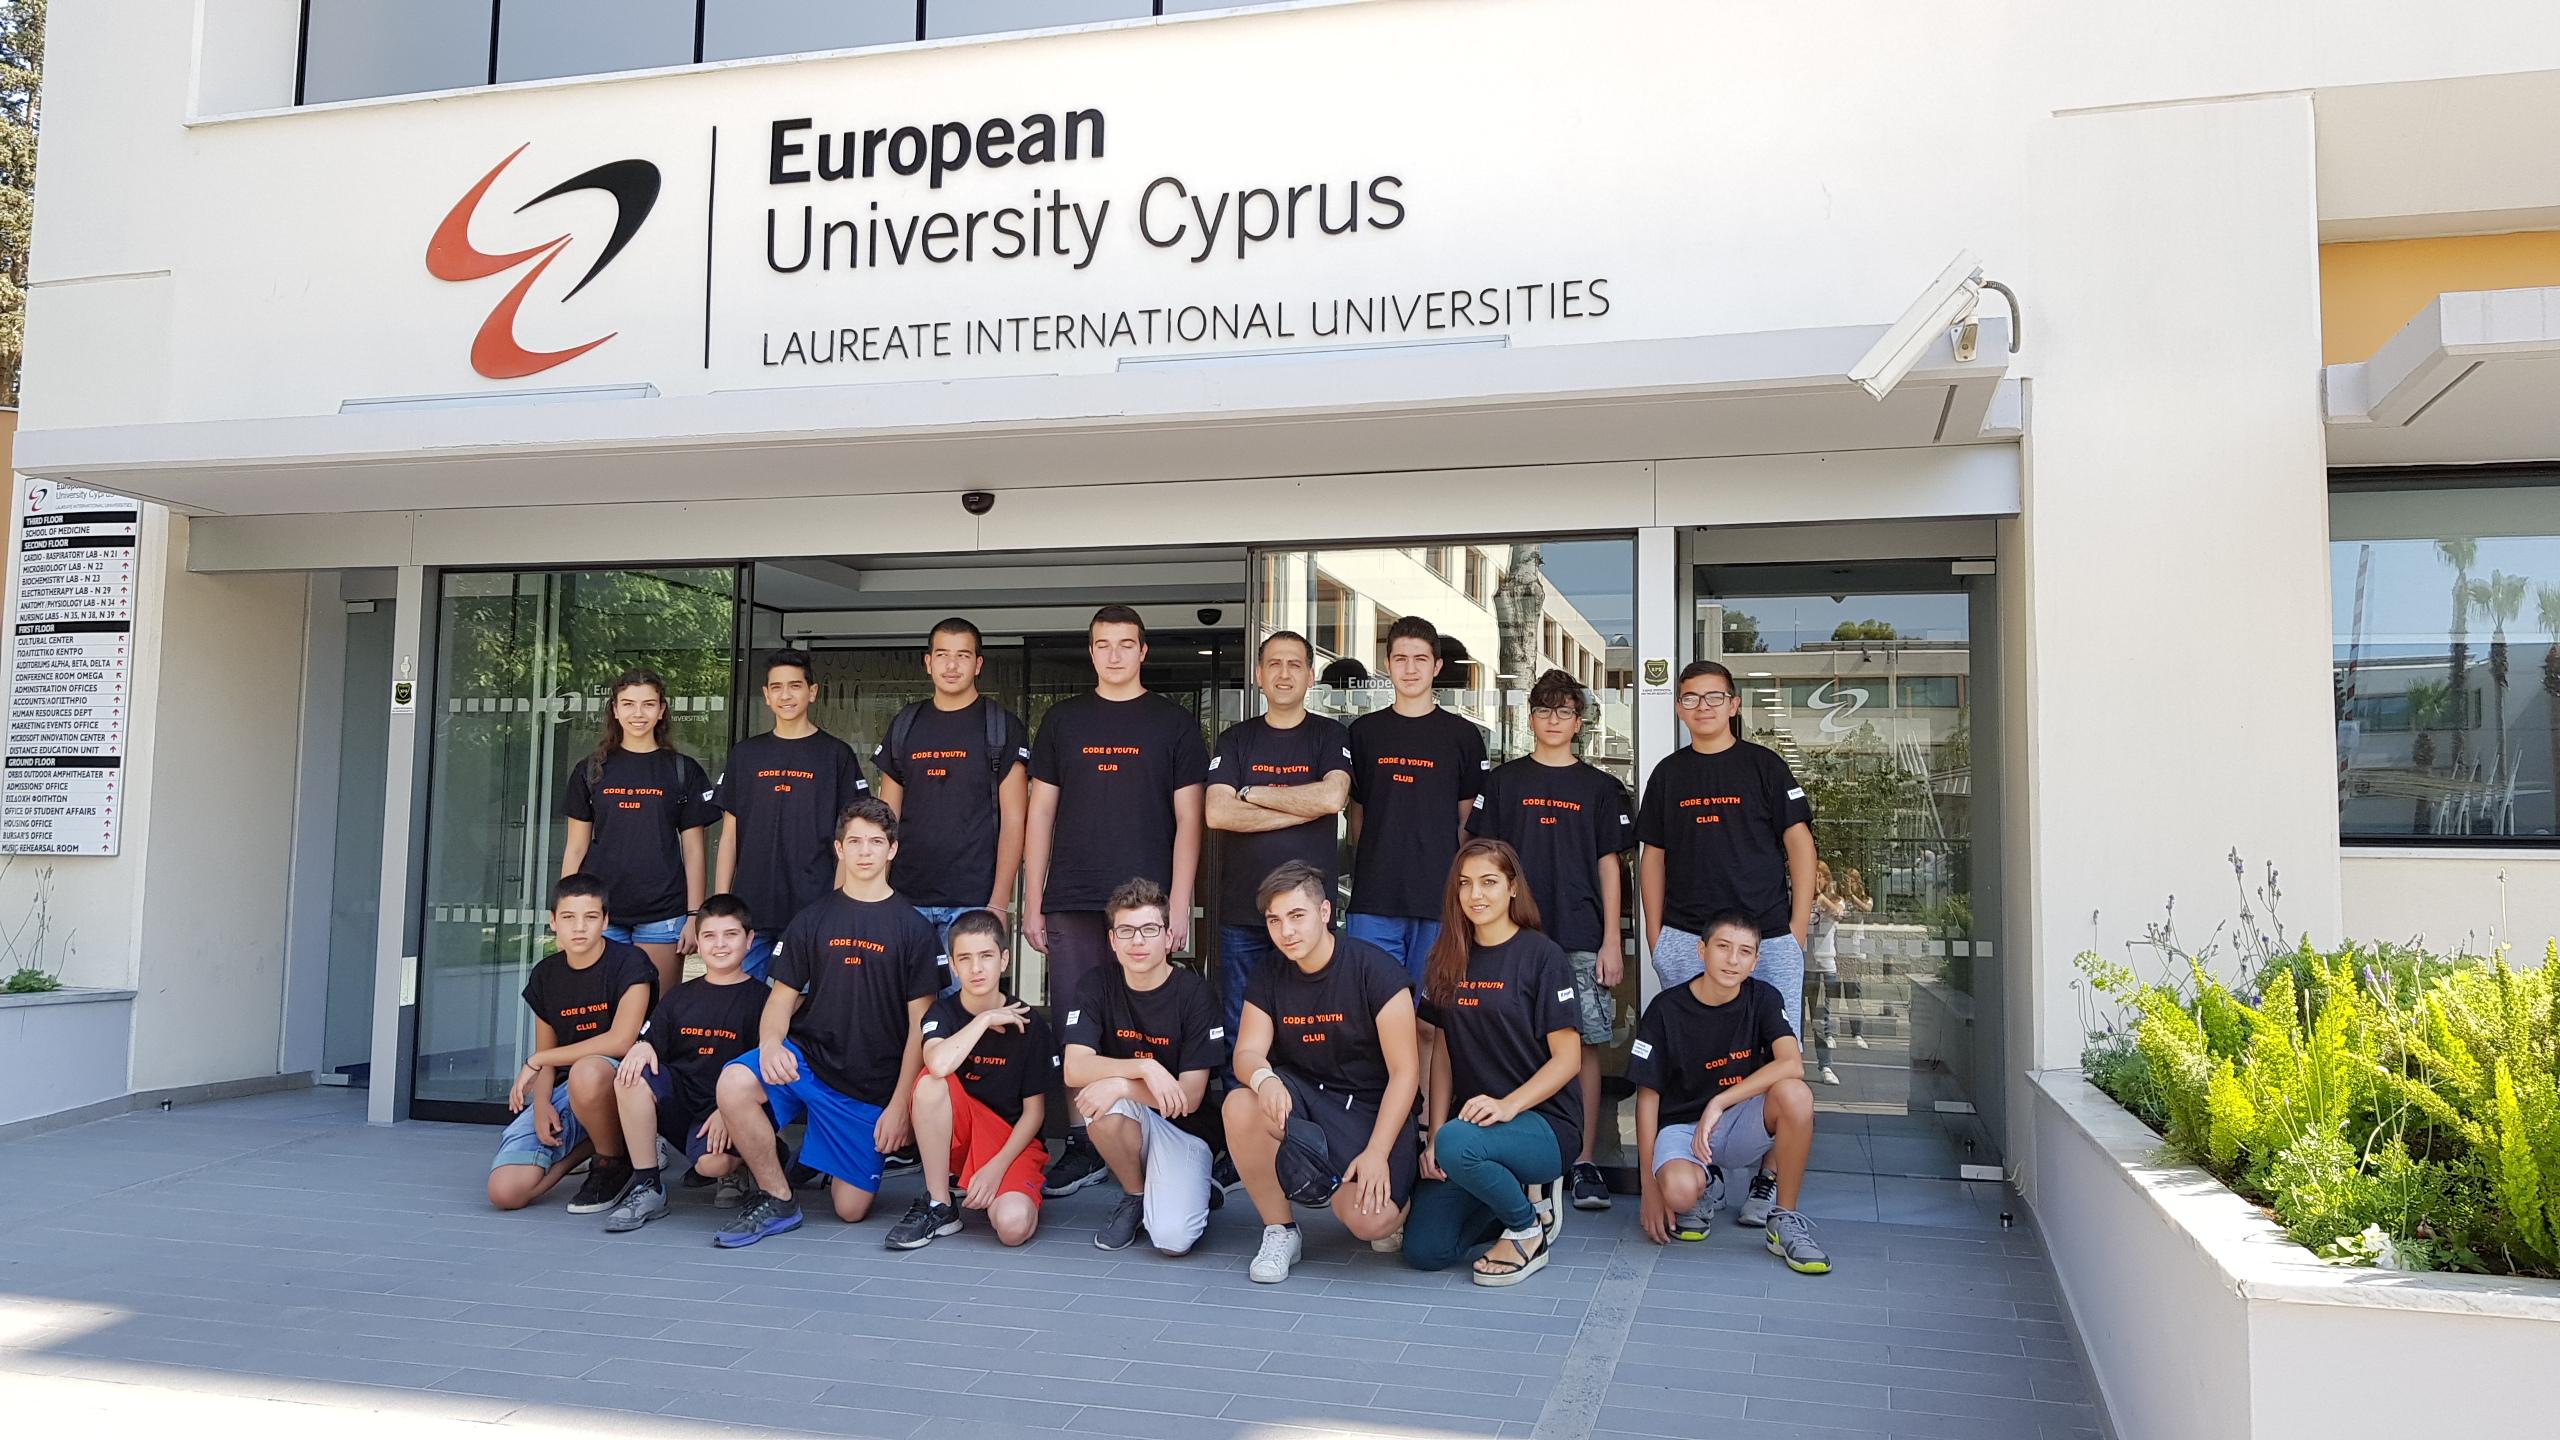 Summer School CYPRUS VISIT EUROPEAN UNIVERSITY